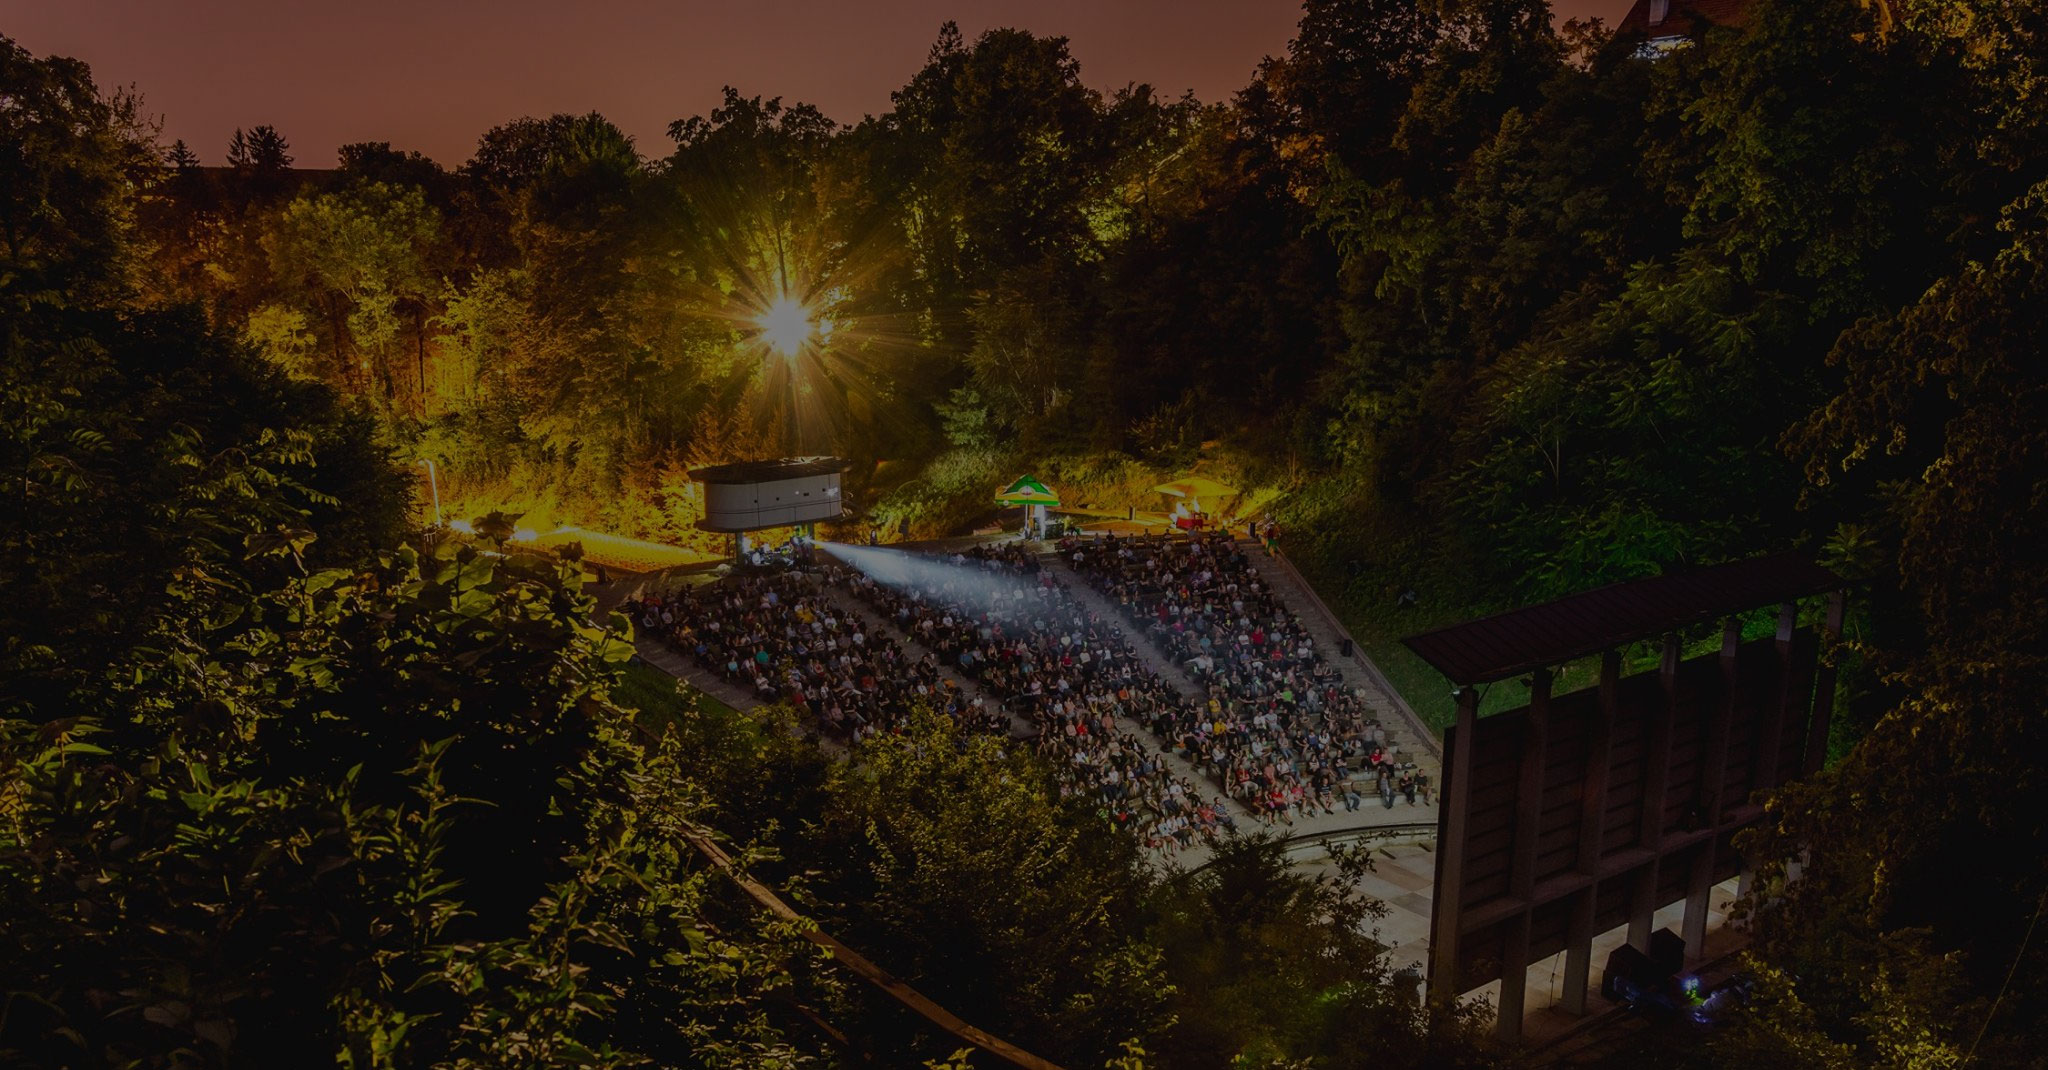 Ljetna pozornica Tuškanac: Drugi dio srpnja 2020.